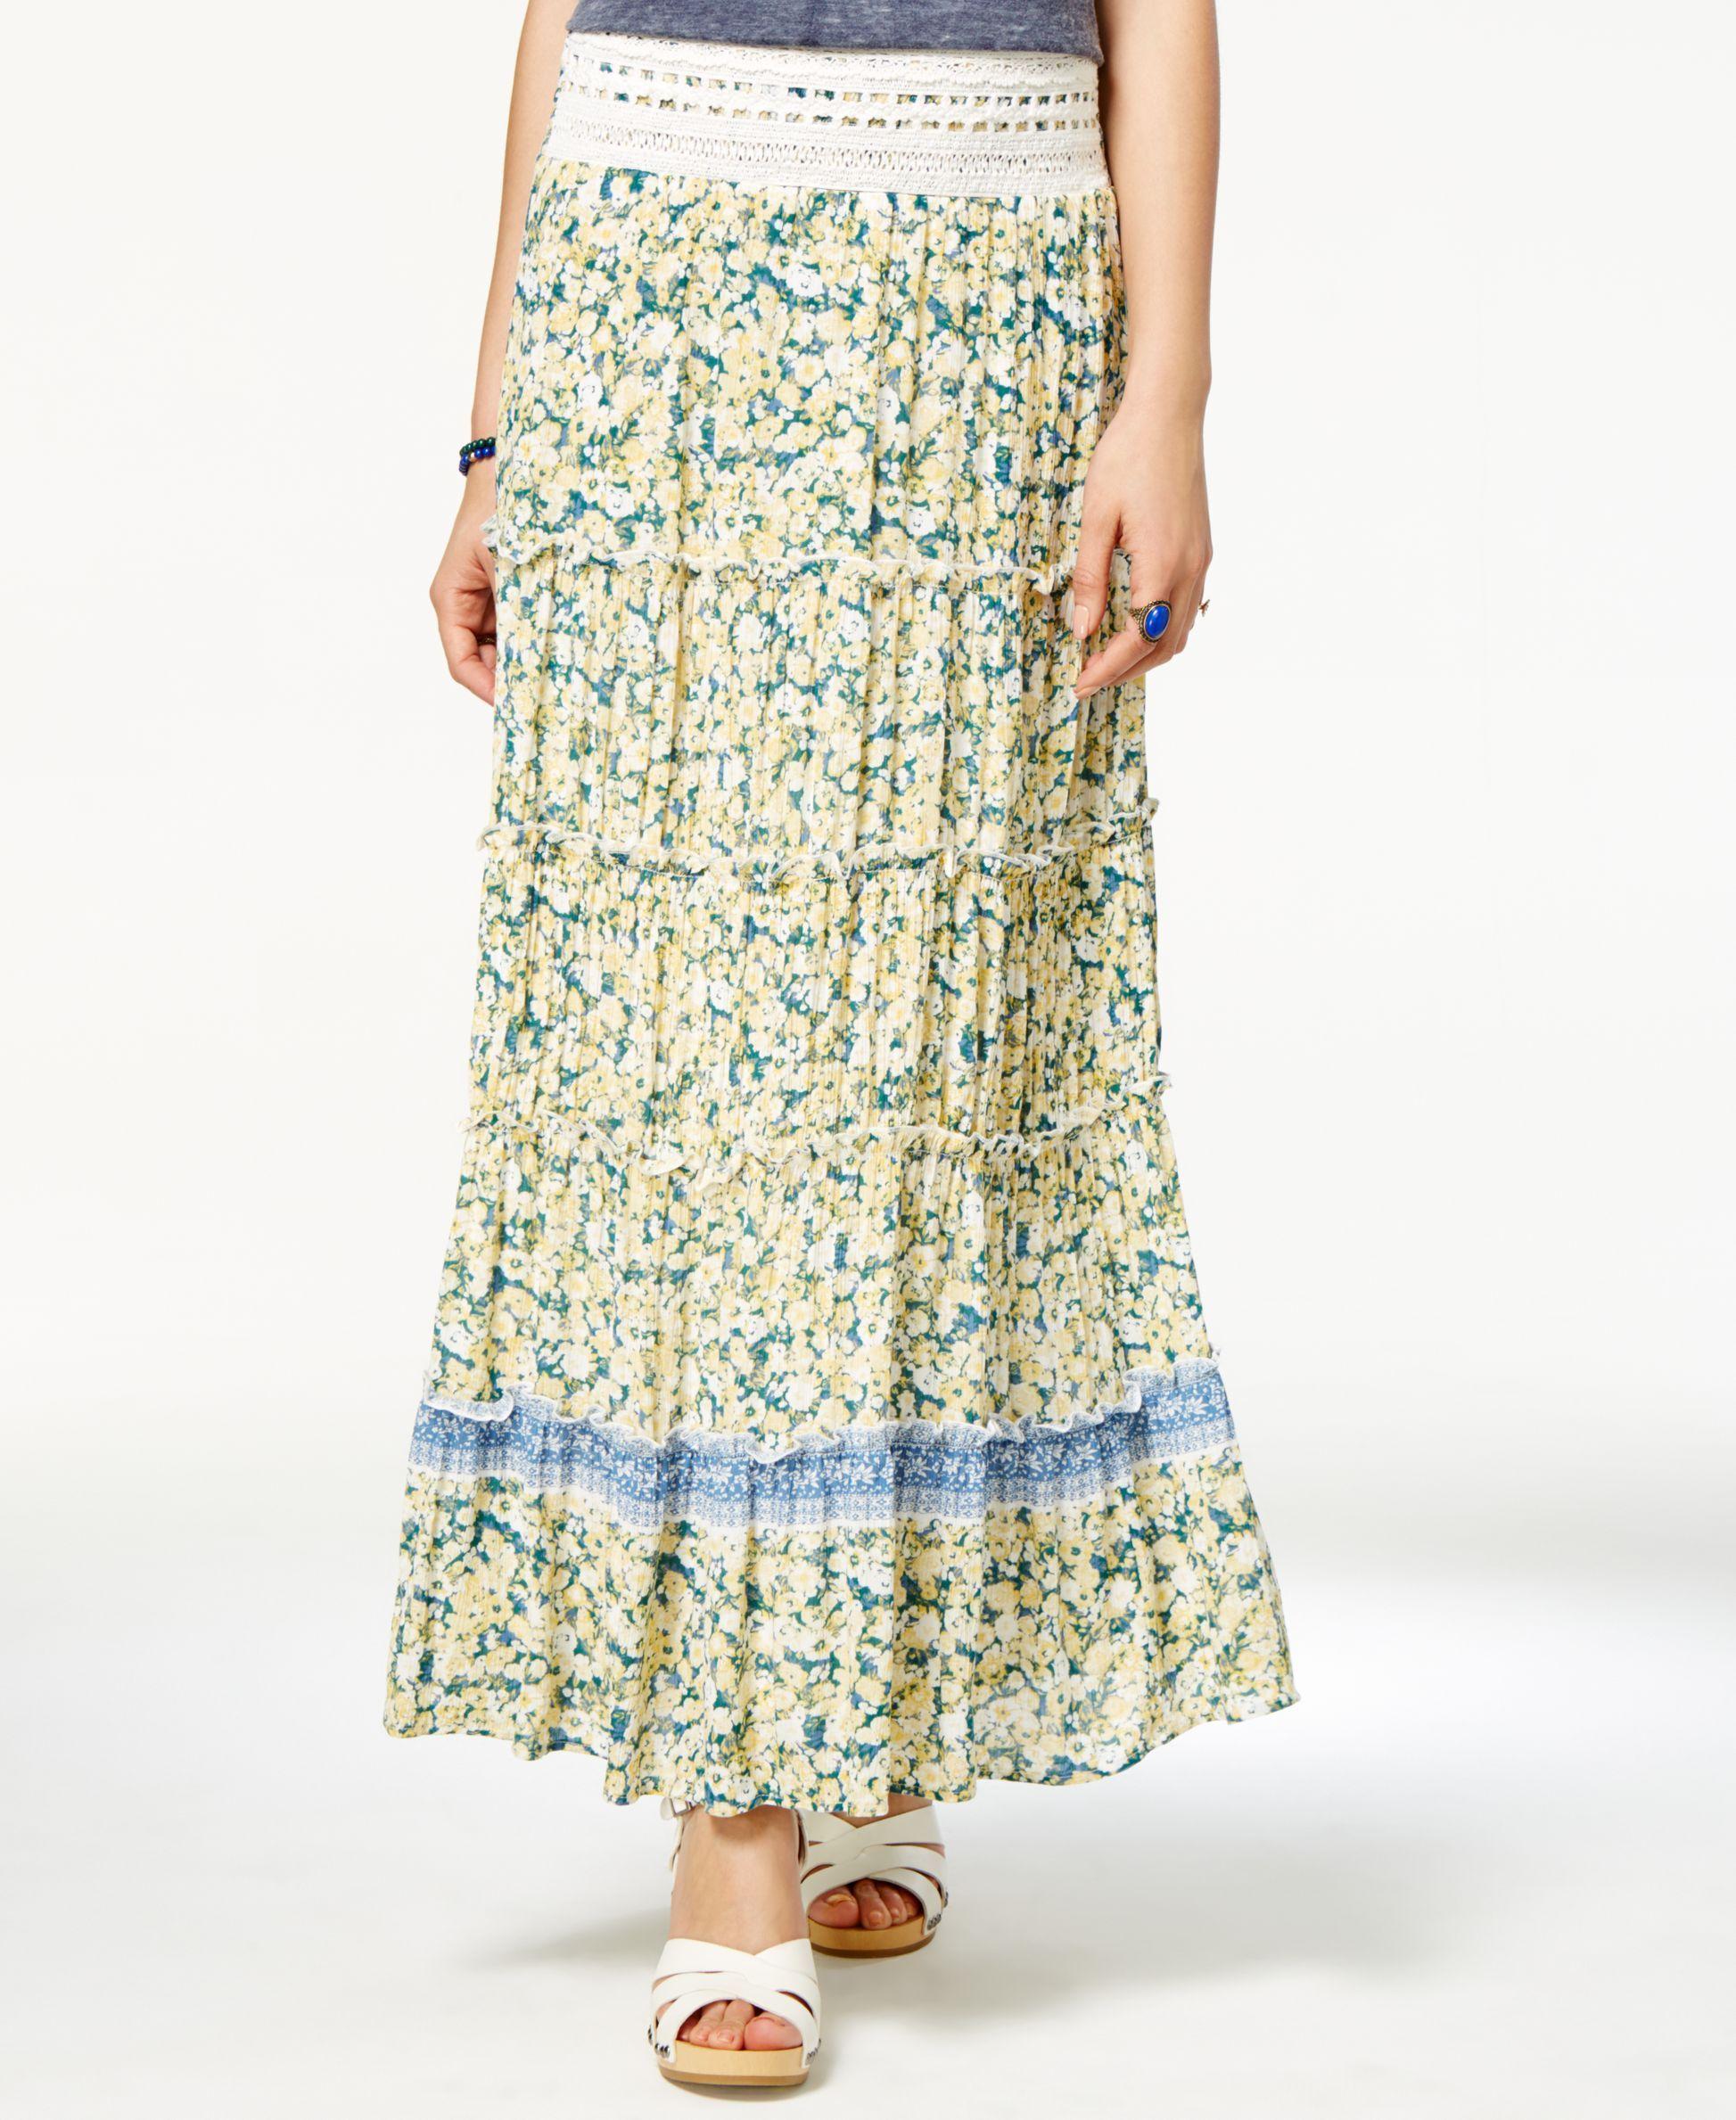 White apron macy's - American Rag Printed Crochet Trim Maxi Skirt Only At Macy S